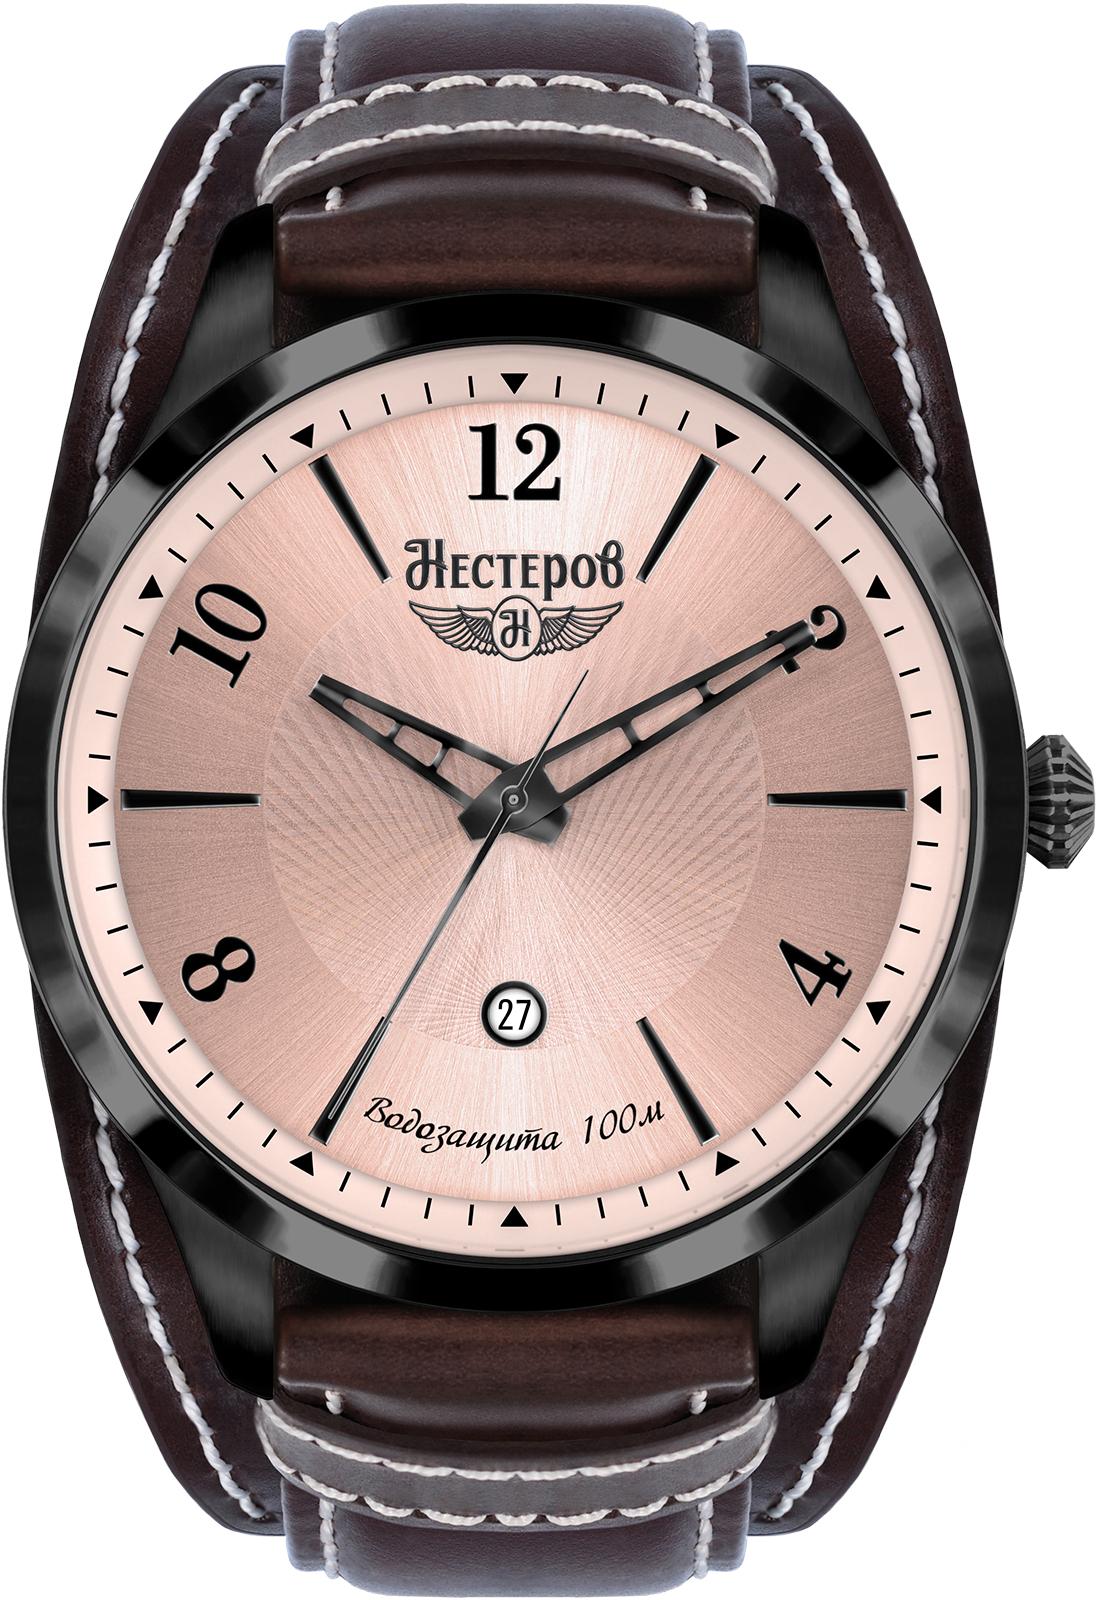 Часы Нестеров H0983A92-14D цена